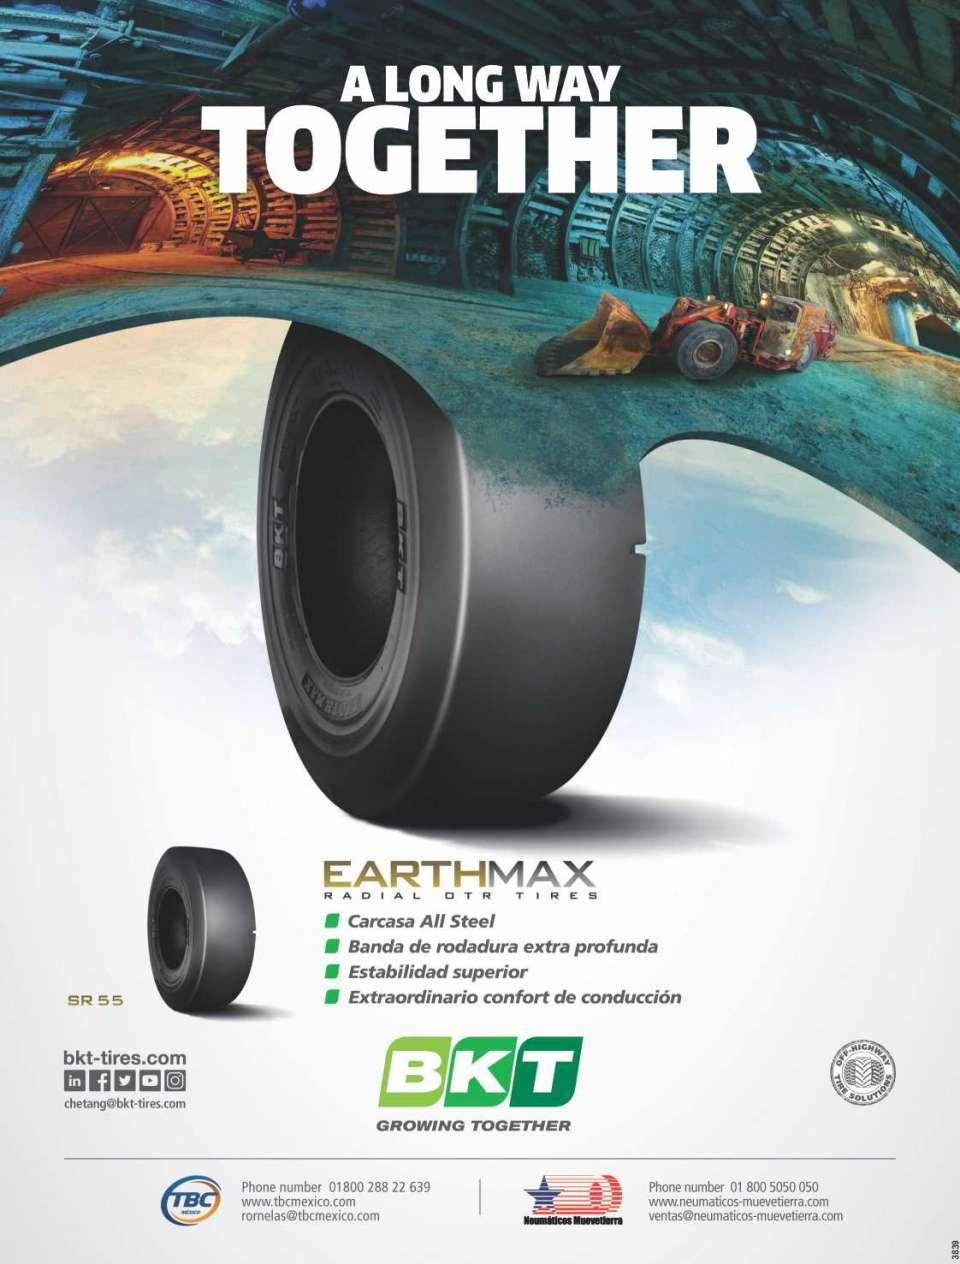 BKT - EARTHMAX - Radial OTR Tires. Neumaticos para maquinaria minera.